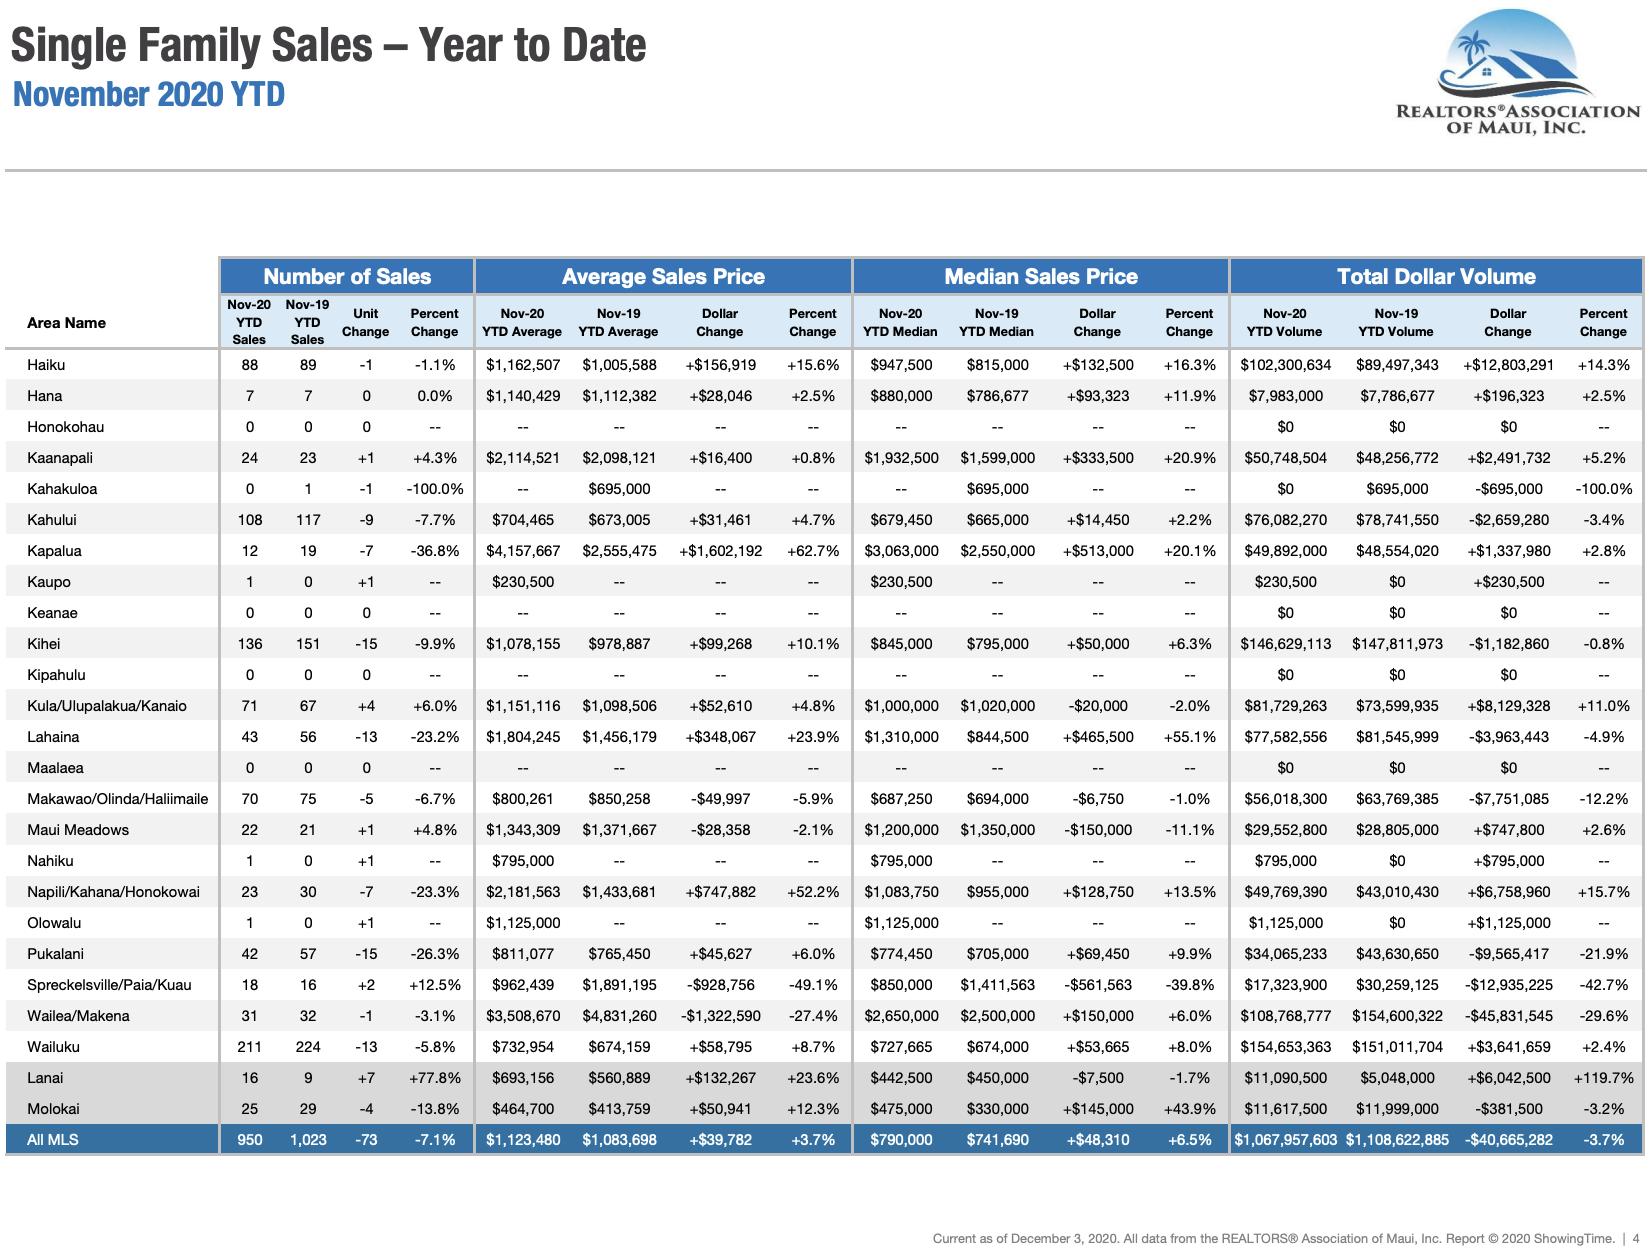 Maui Hawaii single family home sale statistics through November 2020.